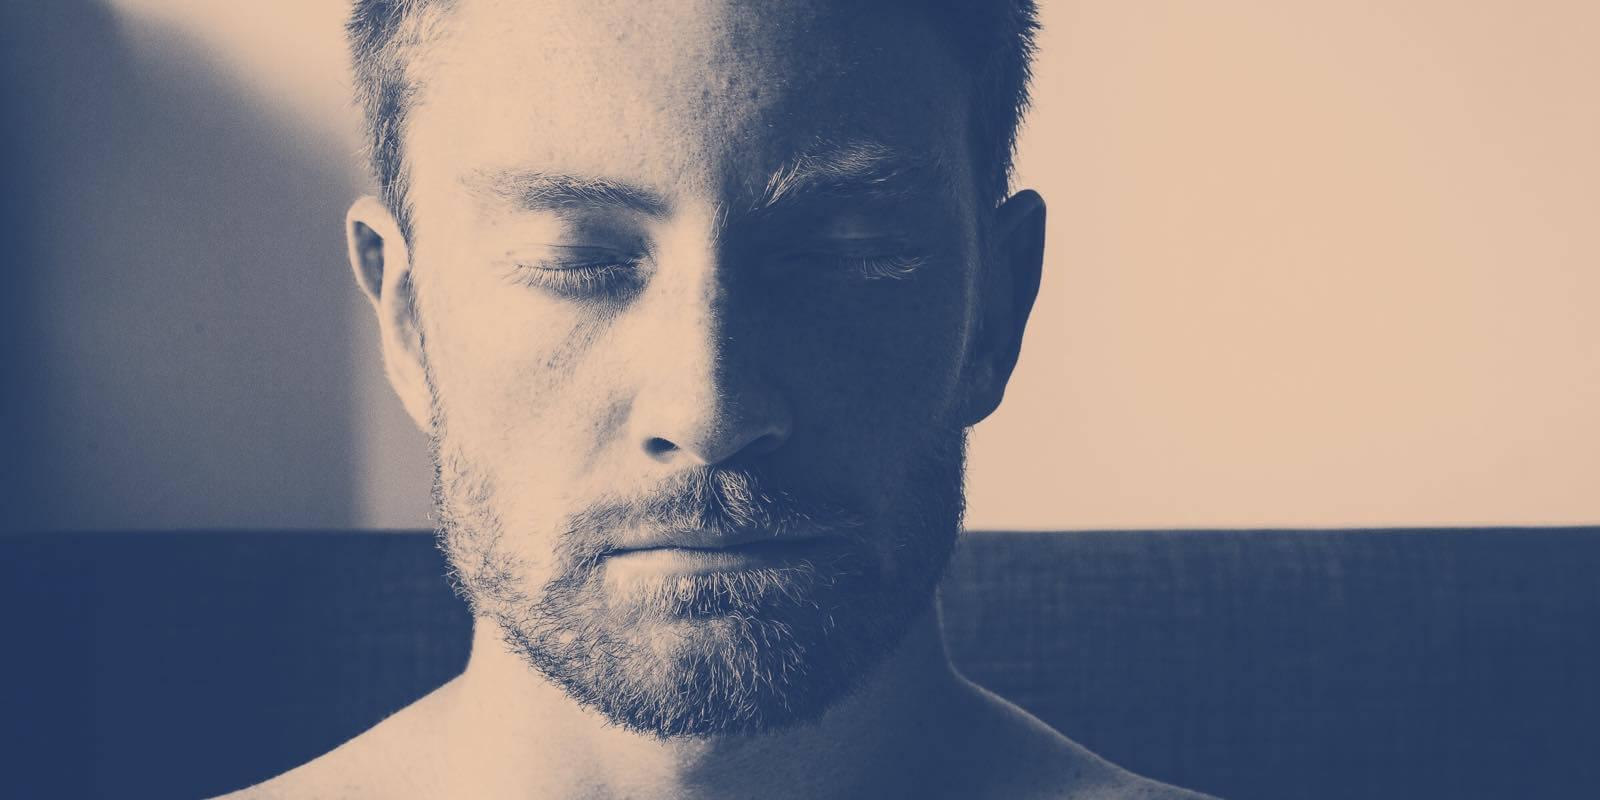 Mindfulness Benefits According to Research Nick Wignall